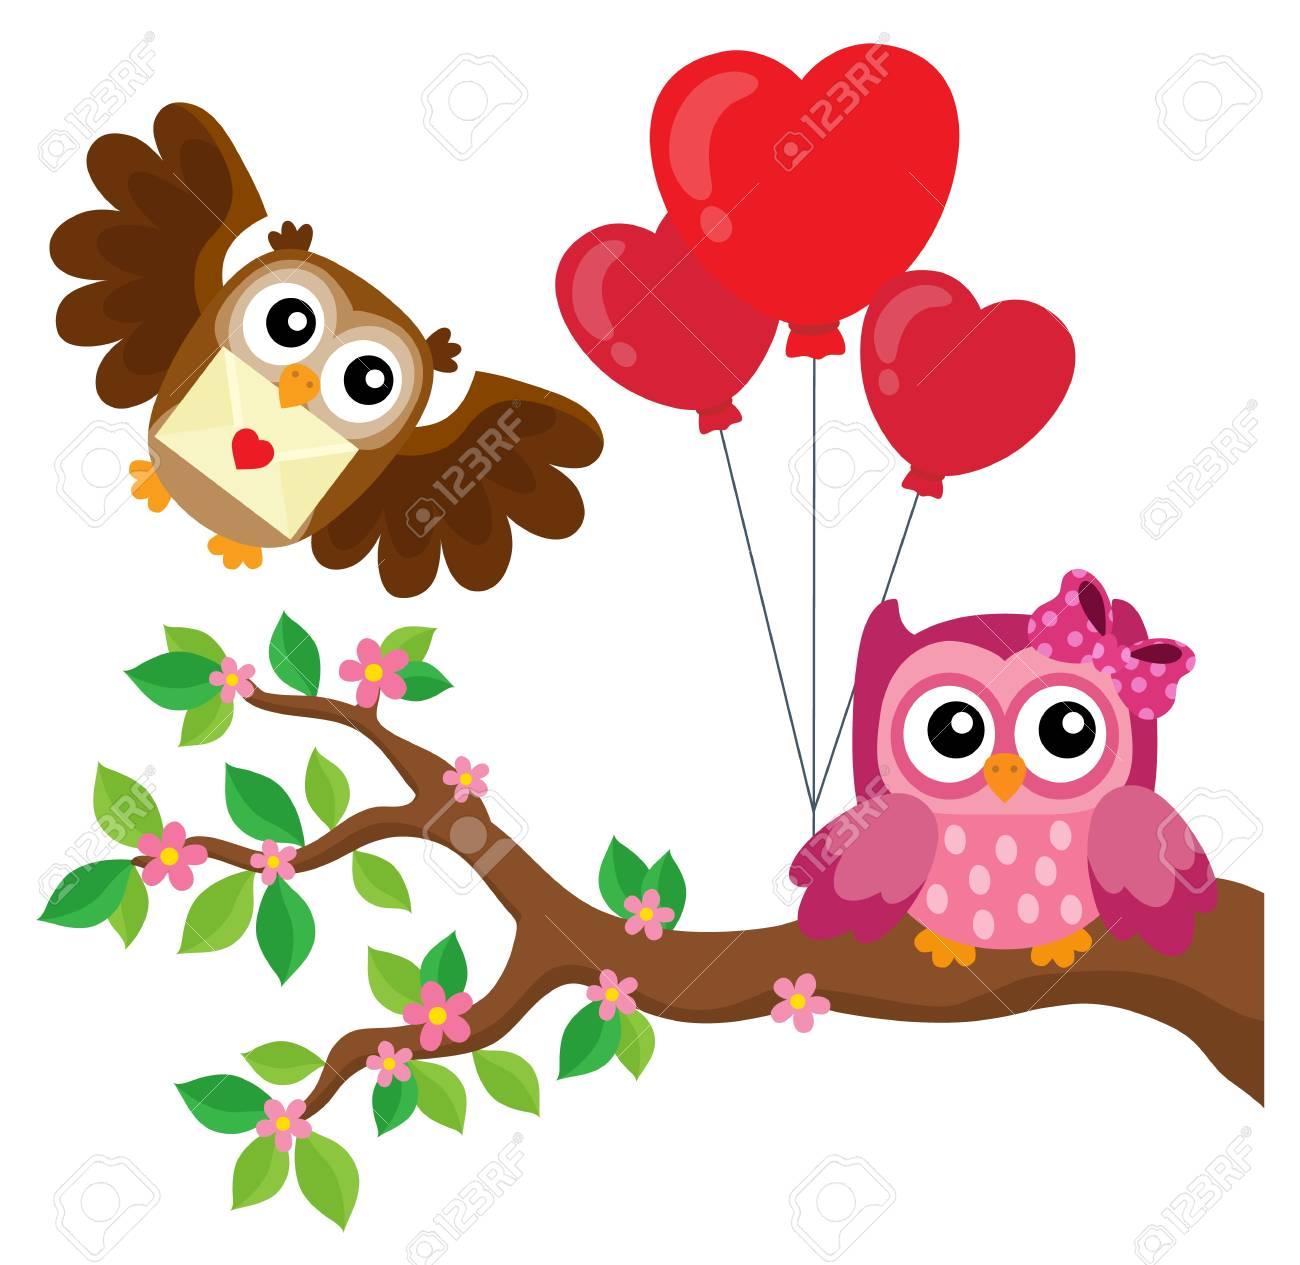 Black - Valentine Owl Clipart - Free Transparent PNG Clipart Images Download